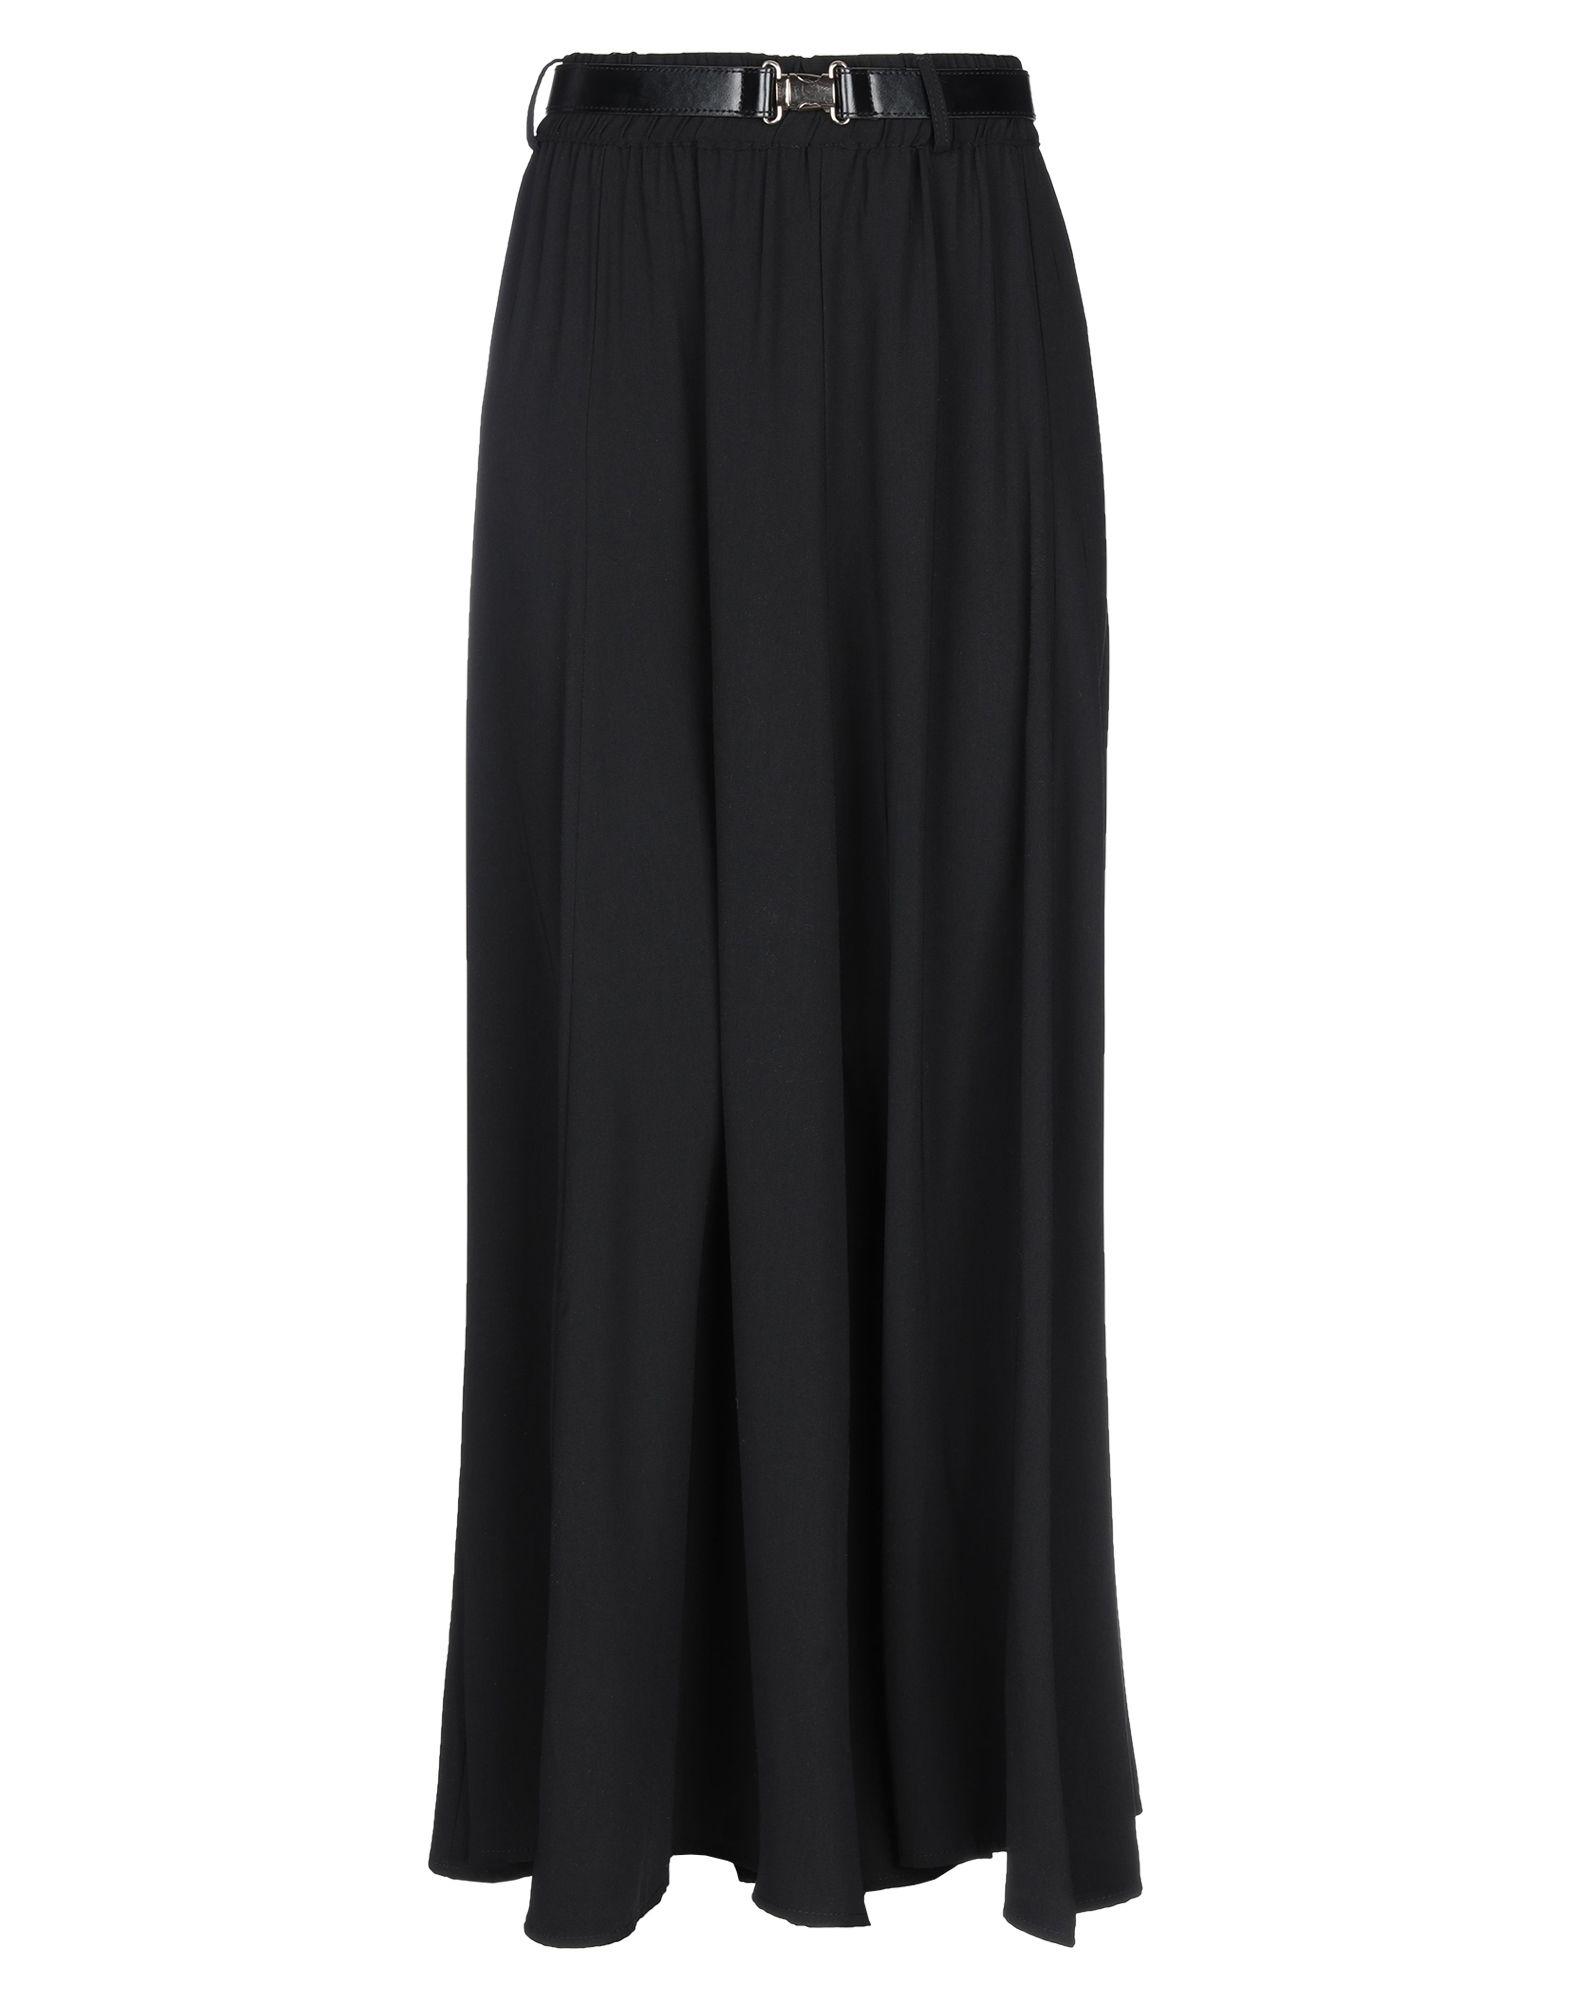 BIANCOGHIACCIO Длинная юбка momoní длинная юбка